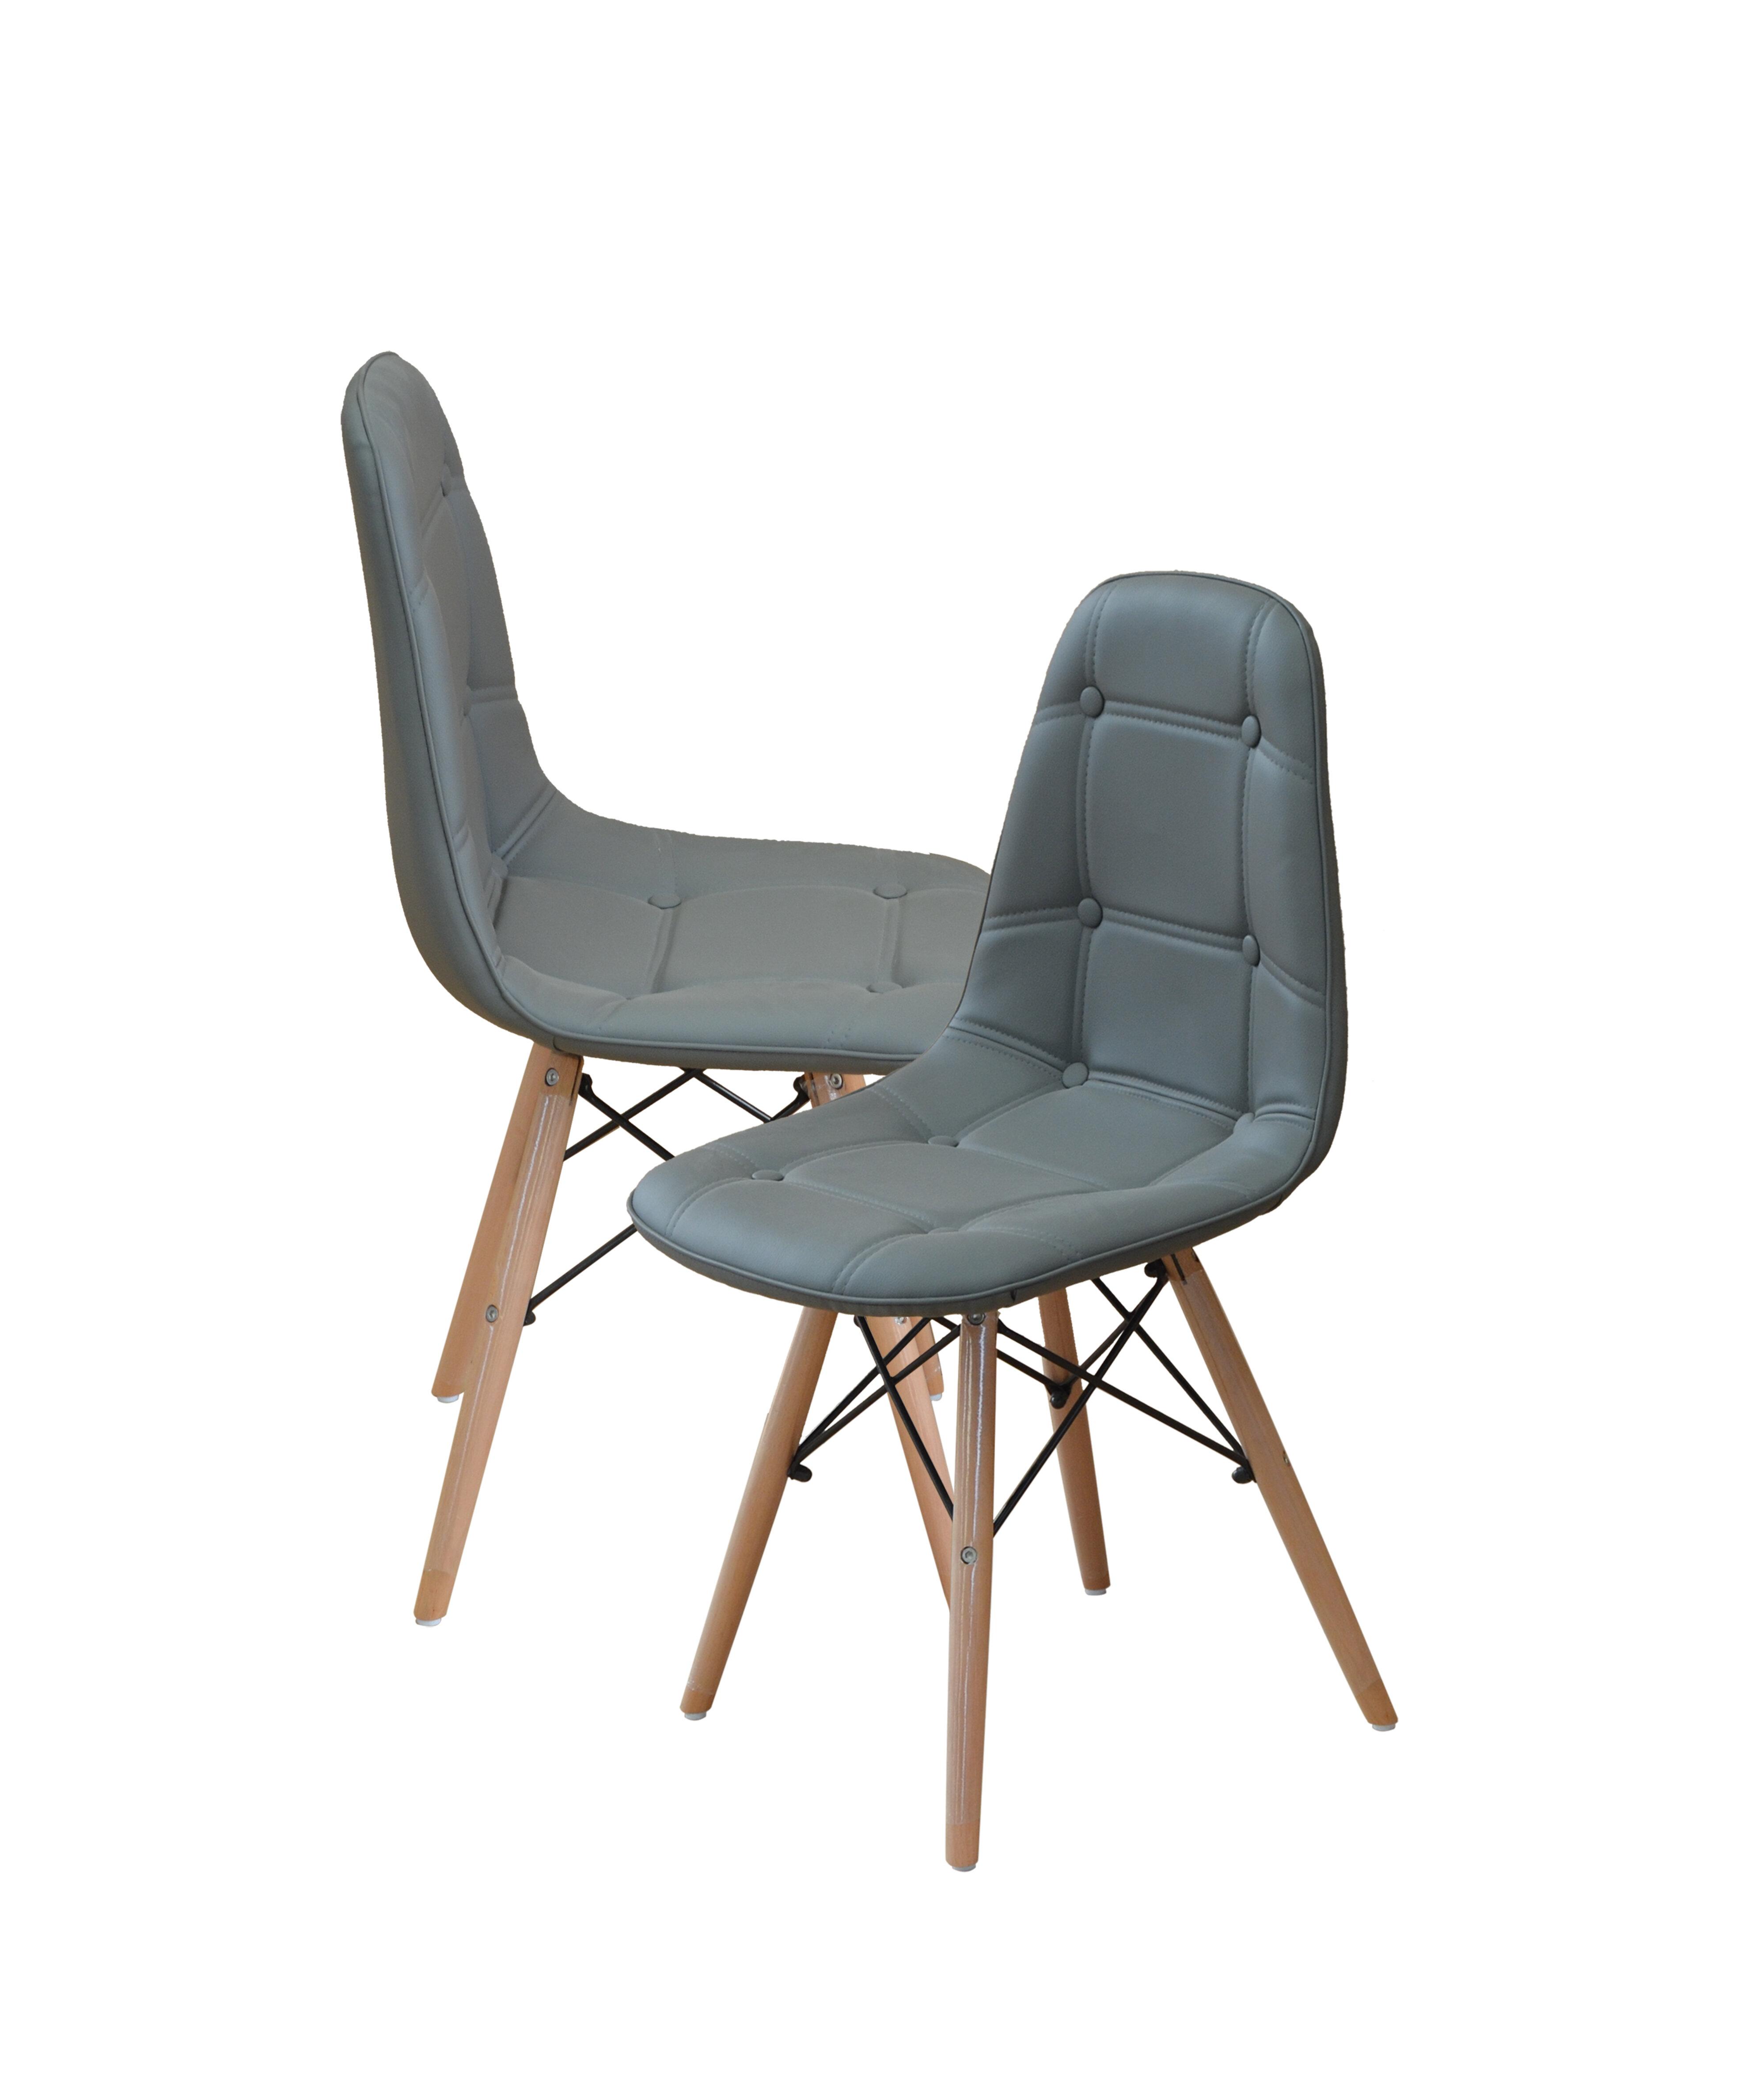 Madison Home USA Modern Tufted Wood Legs Side Chair U0026 Reviews   Wayfair